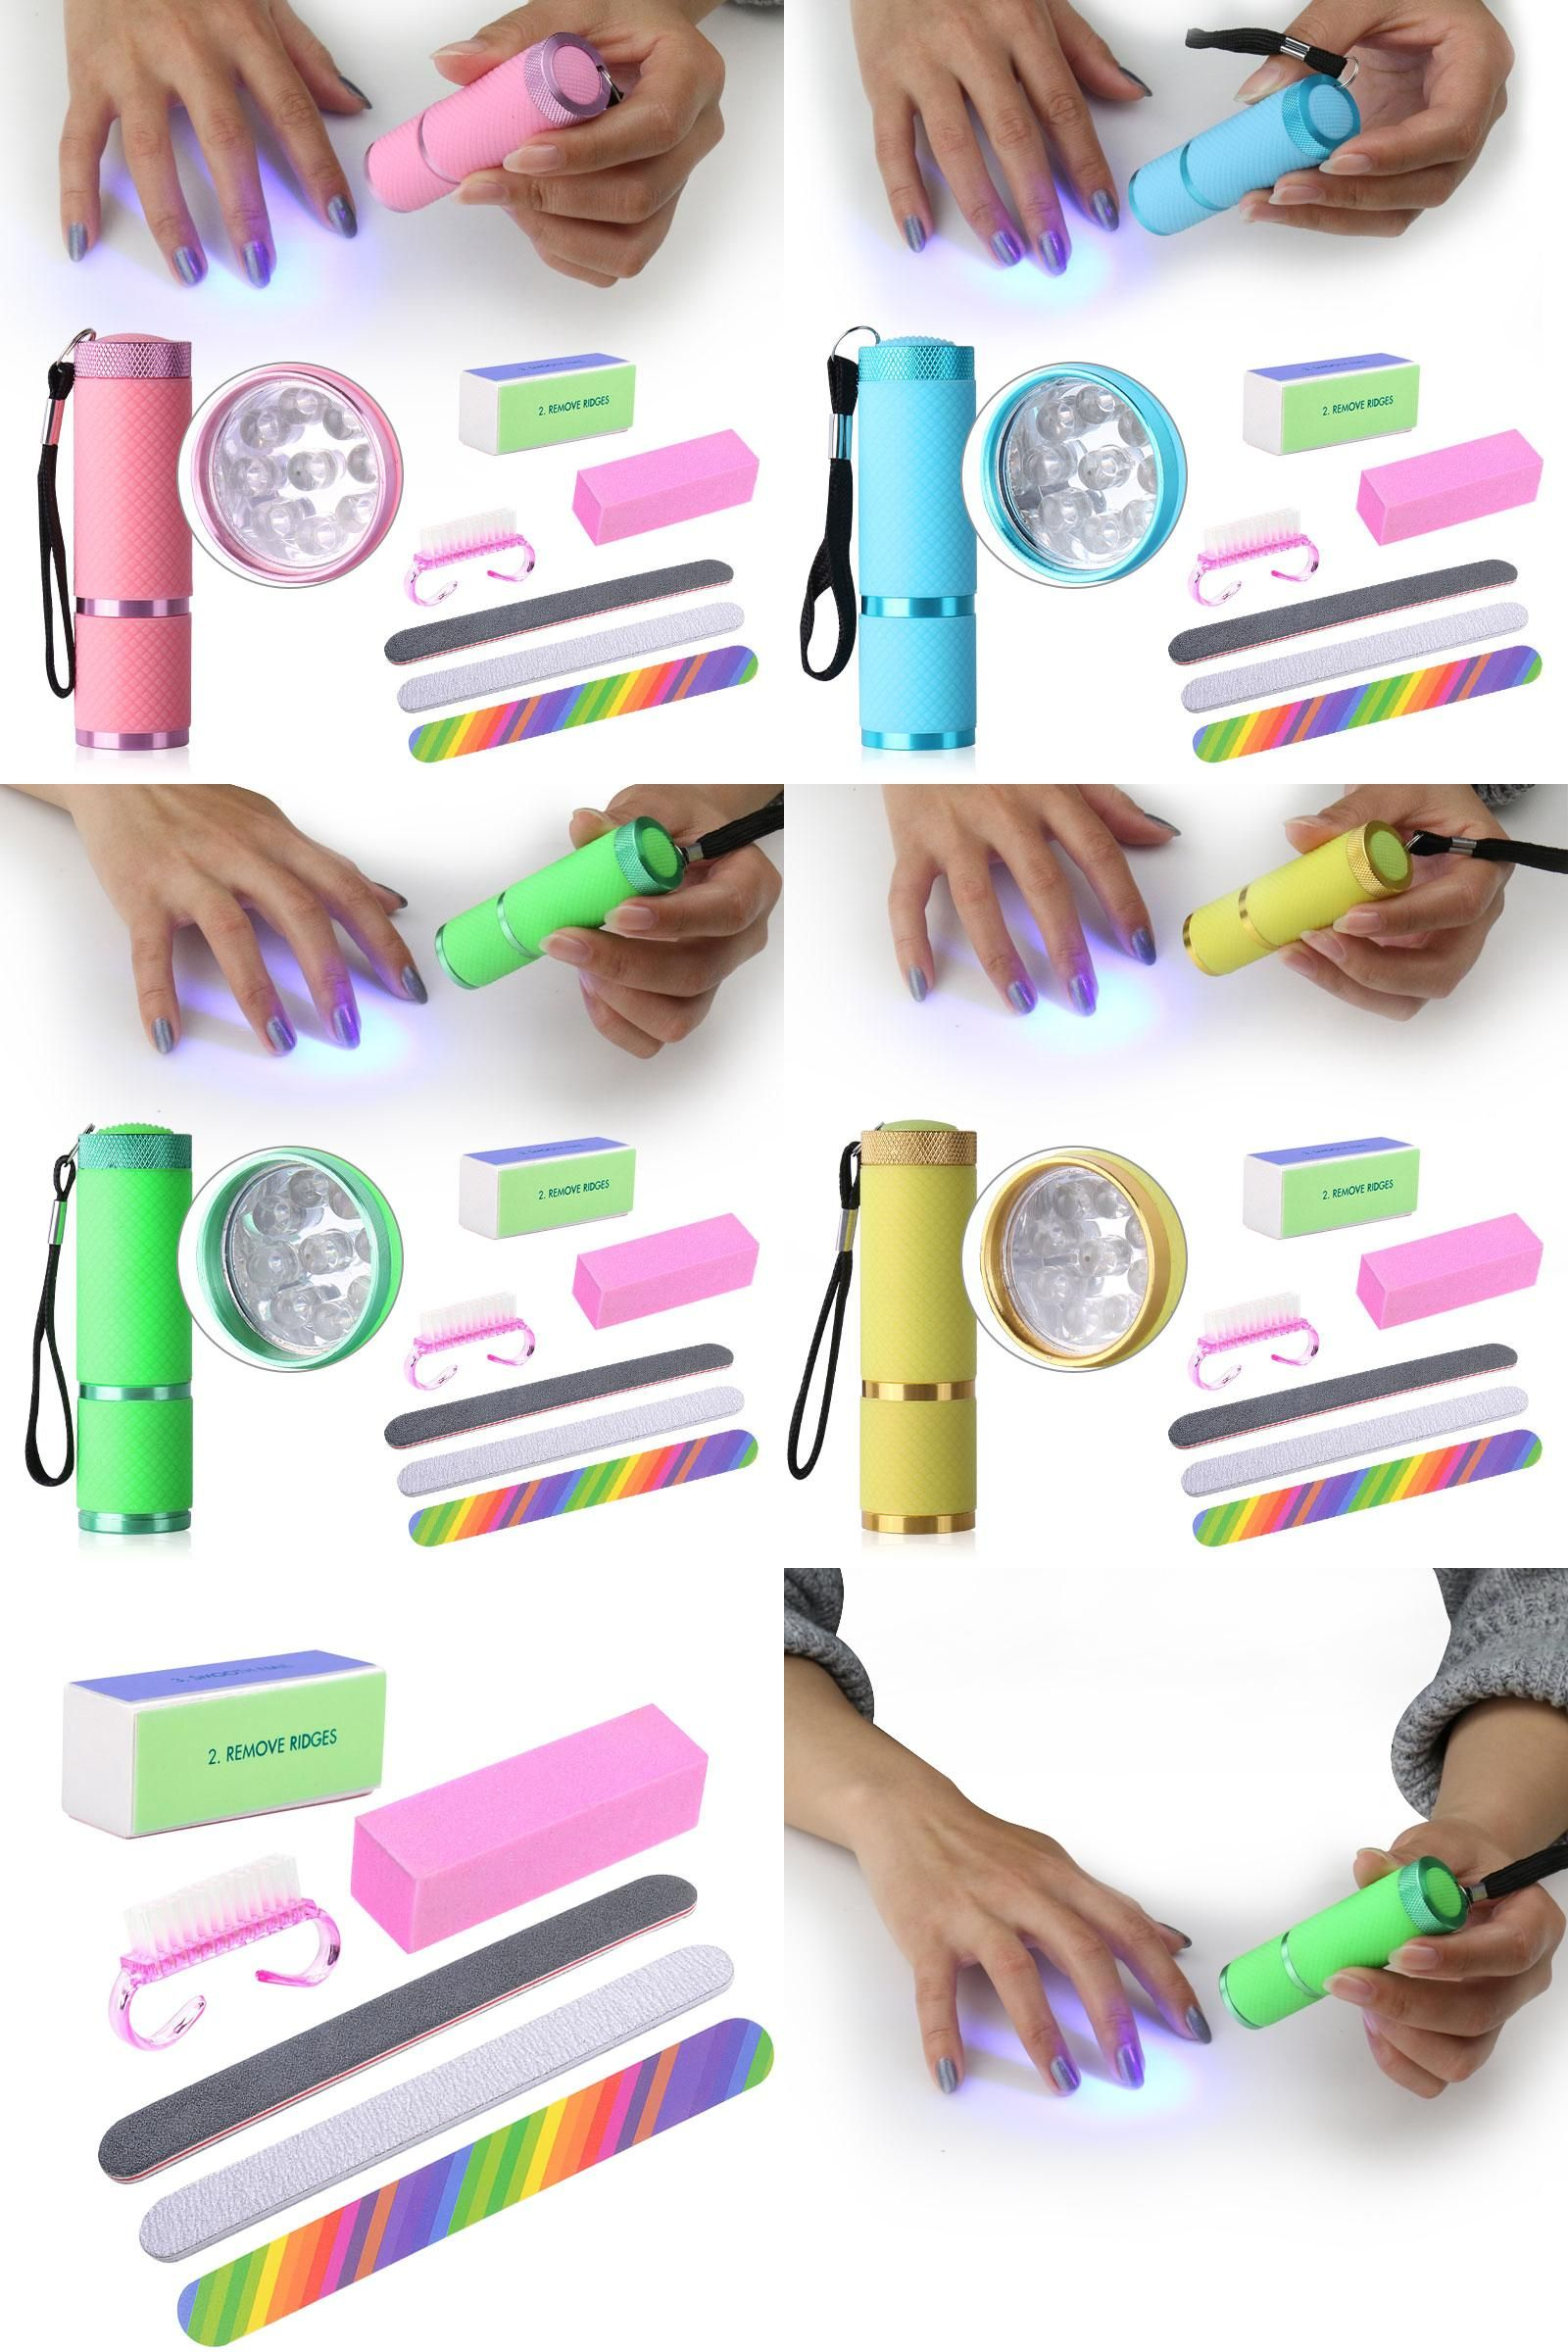 Visit to Buy] Belen 9W Nail Dryer LED Flashlight UV Lamp Portable ...